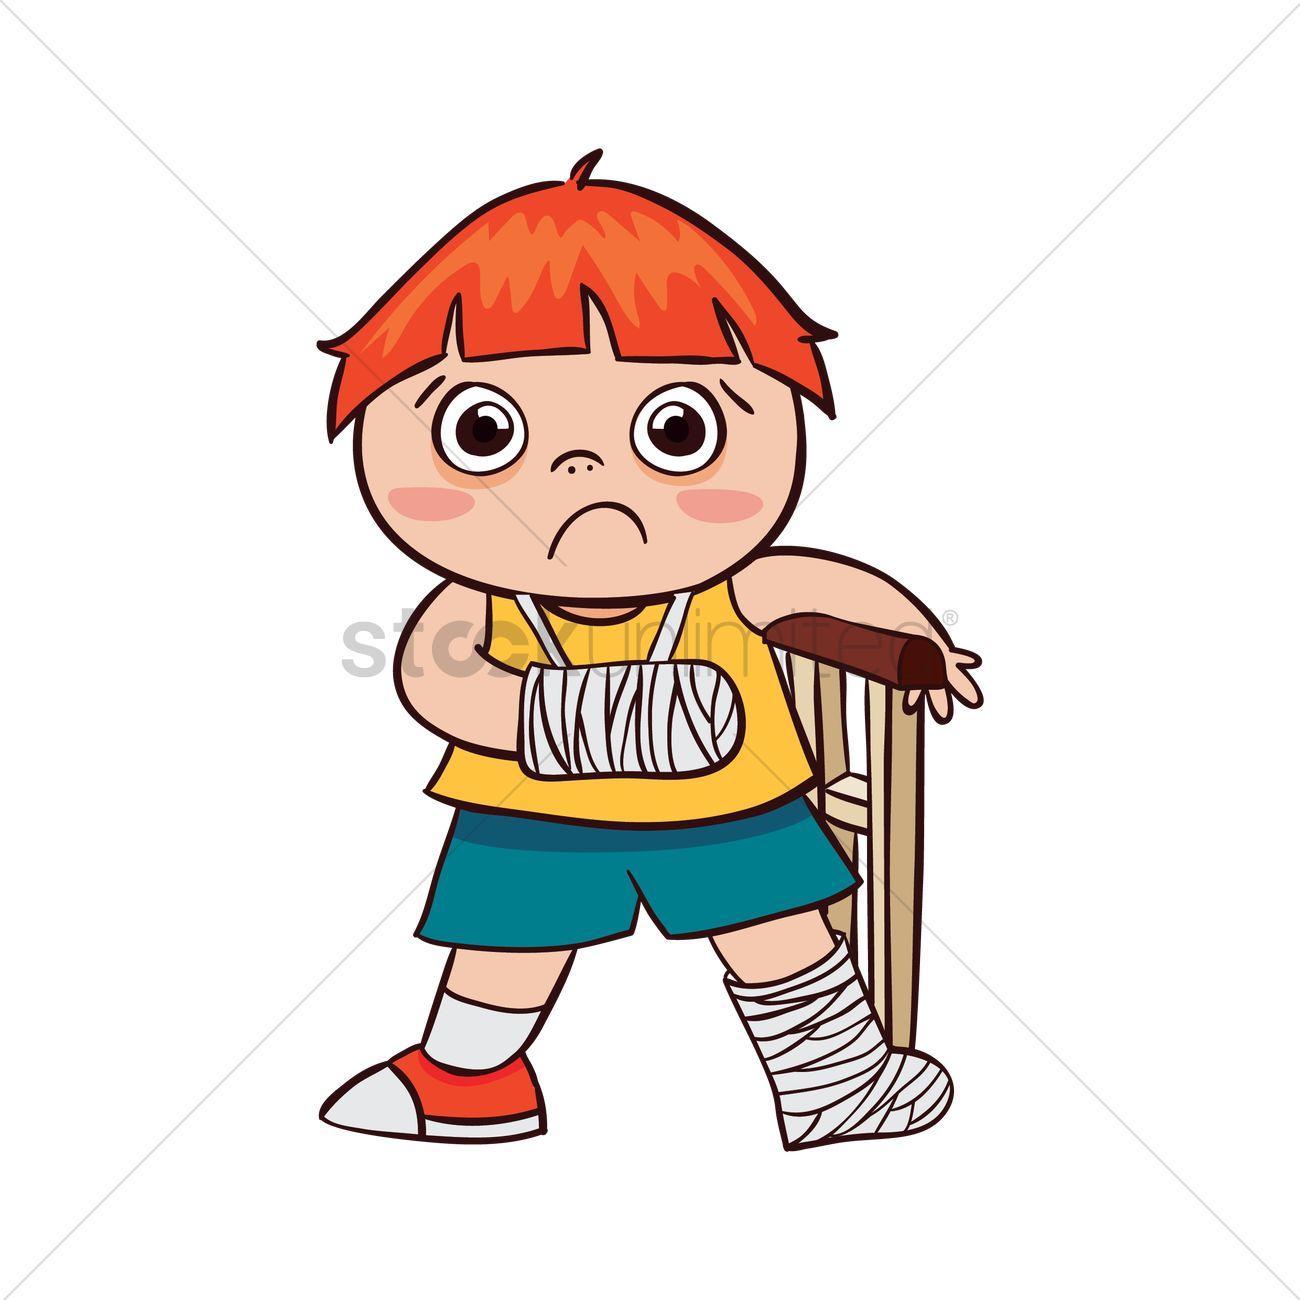 Boy with broken arm and leg Vector Image.